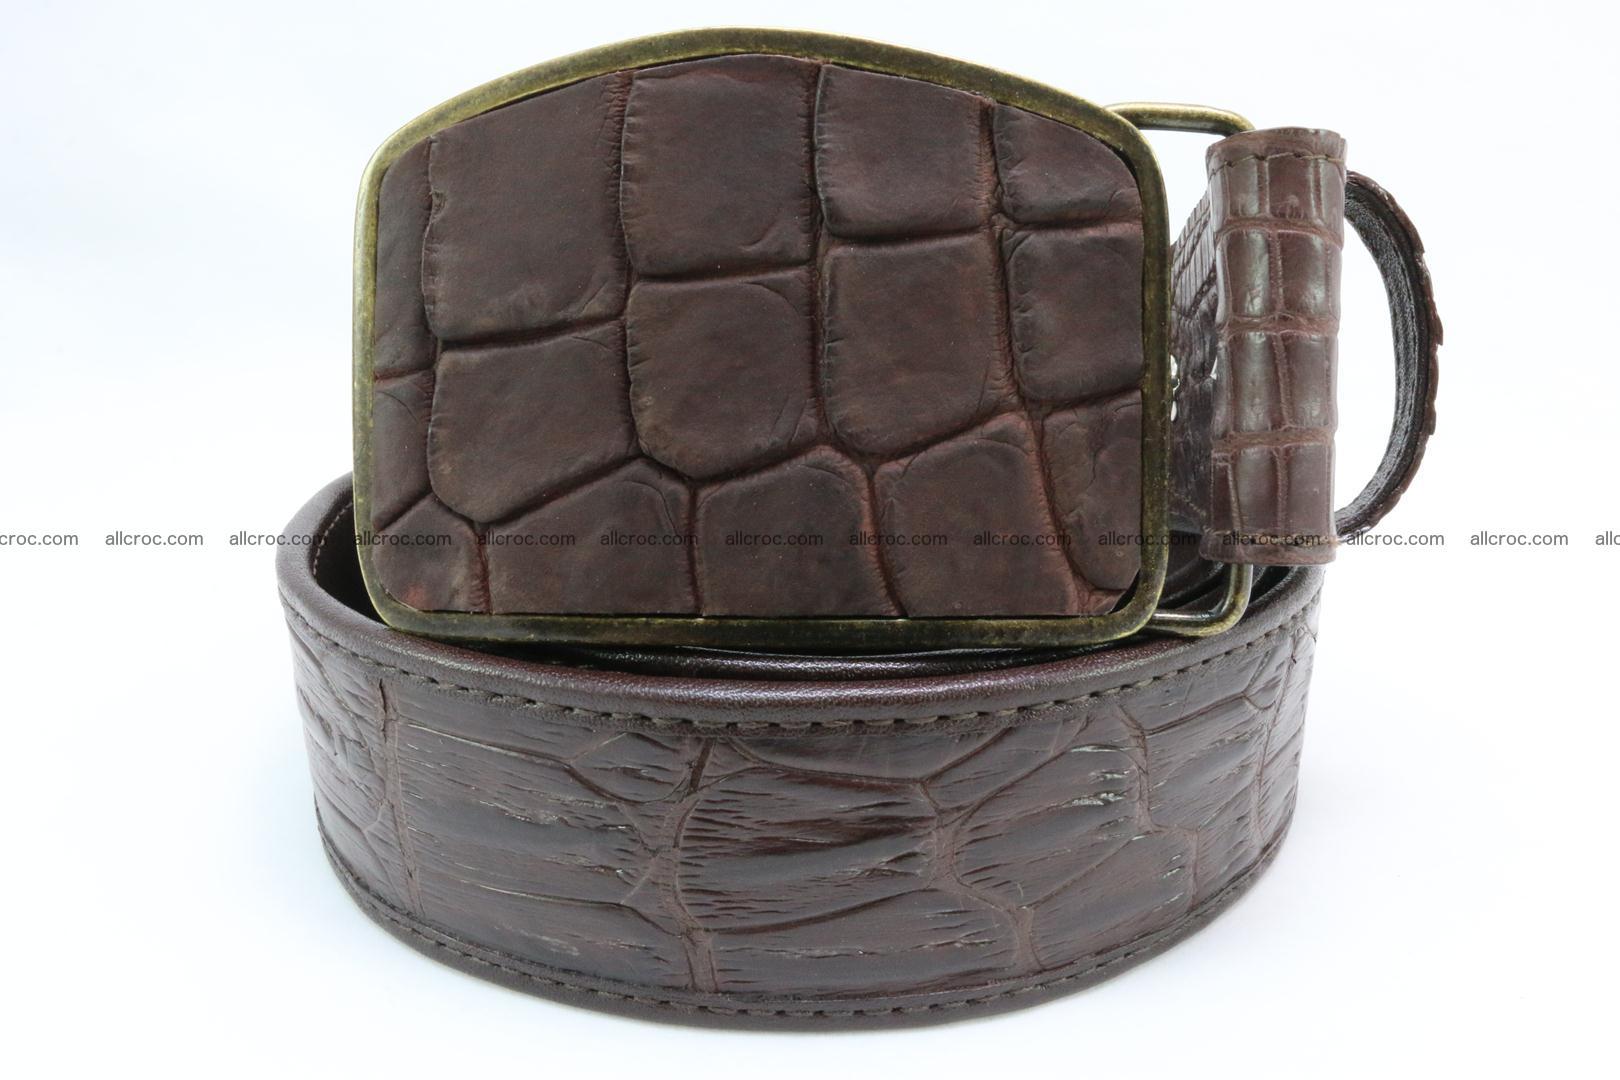 Genuine crocodile leather hornback belt 084 Foto 1